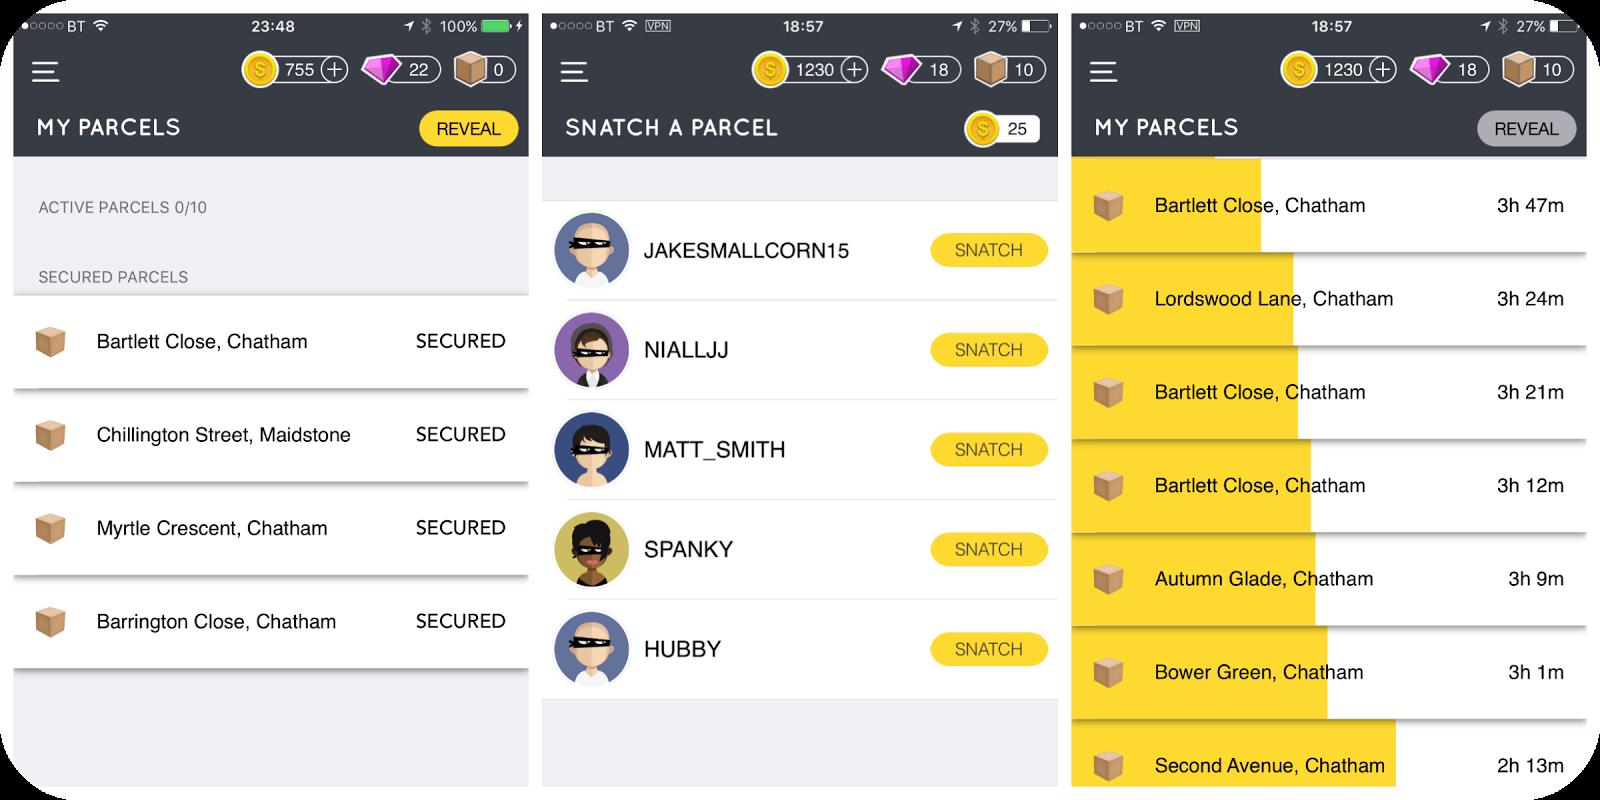 snatch app how to get parcels